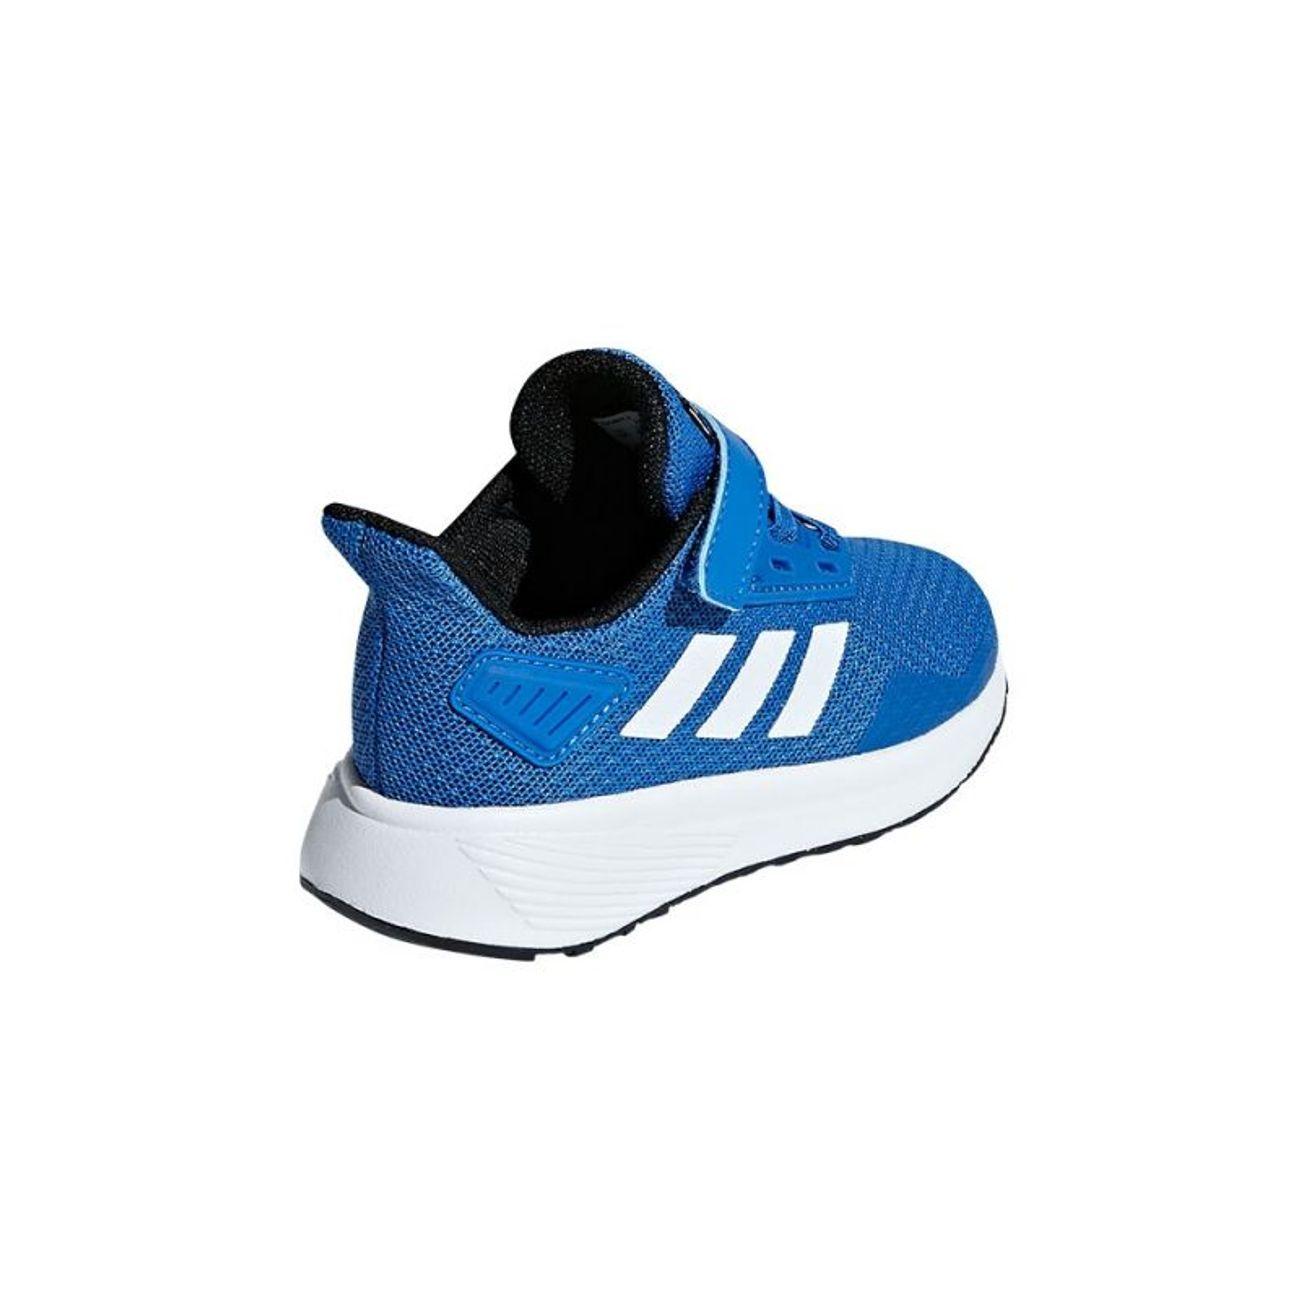 Adidas Bébé Duramo Padel Adulte Bc0823 9 Blue m8wNvn0